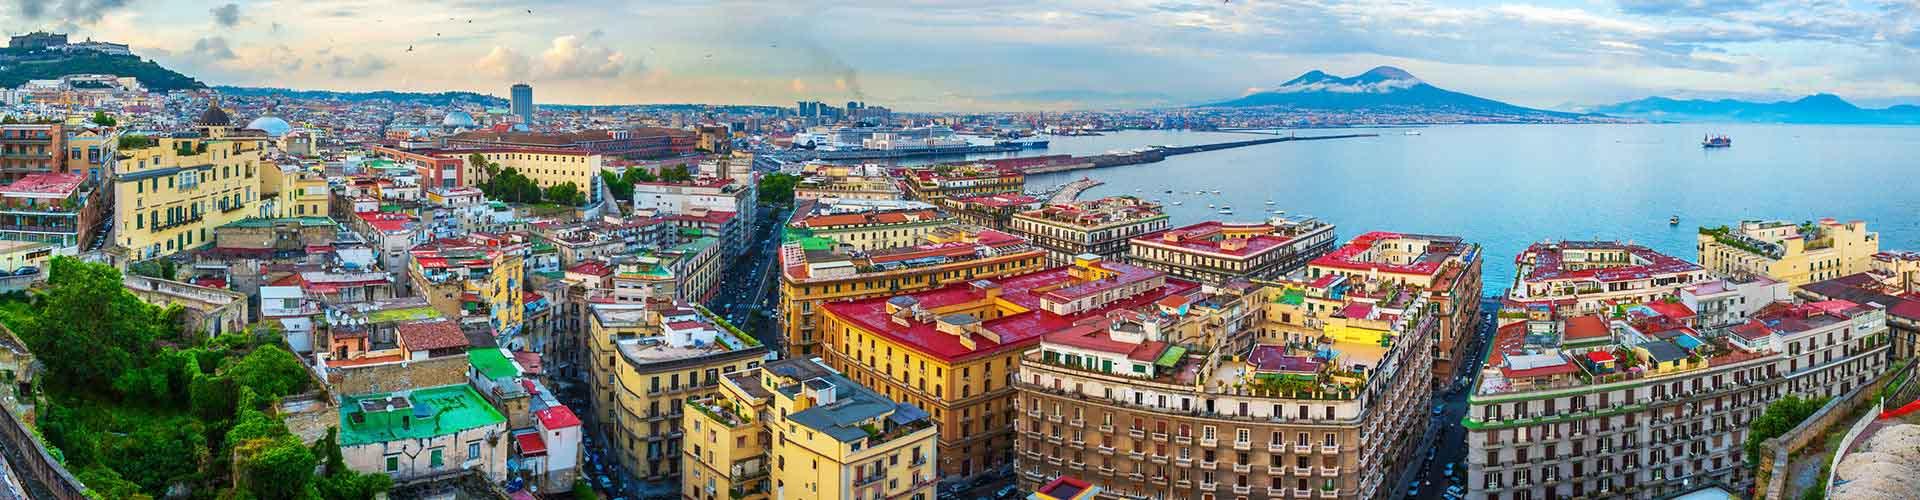 Neapel – Studentenunterkünfte, Hostels und Büroräume in Neapel (Italien). Karte von Neapel, Fotos und Rezensionen von Studentenunterkünften, Hostels und Büroräumen in Neapel.